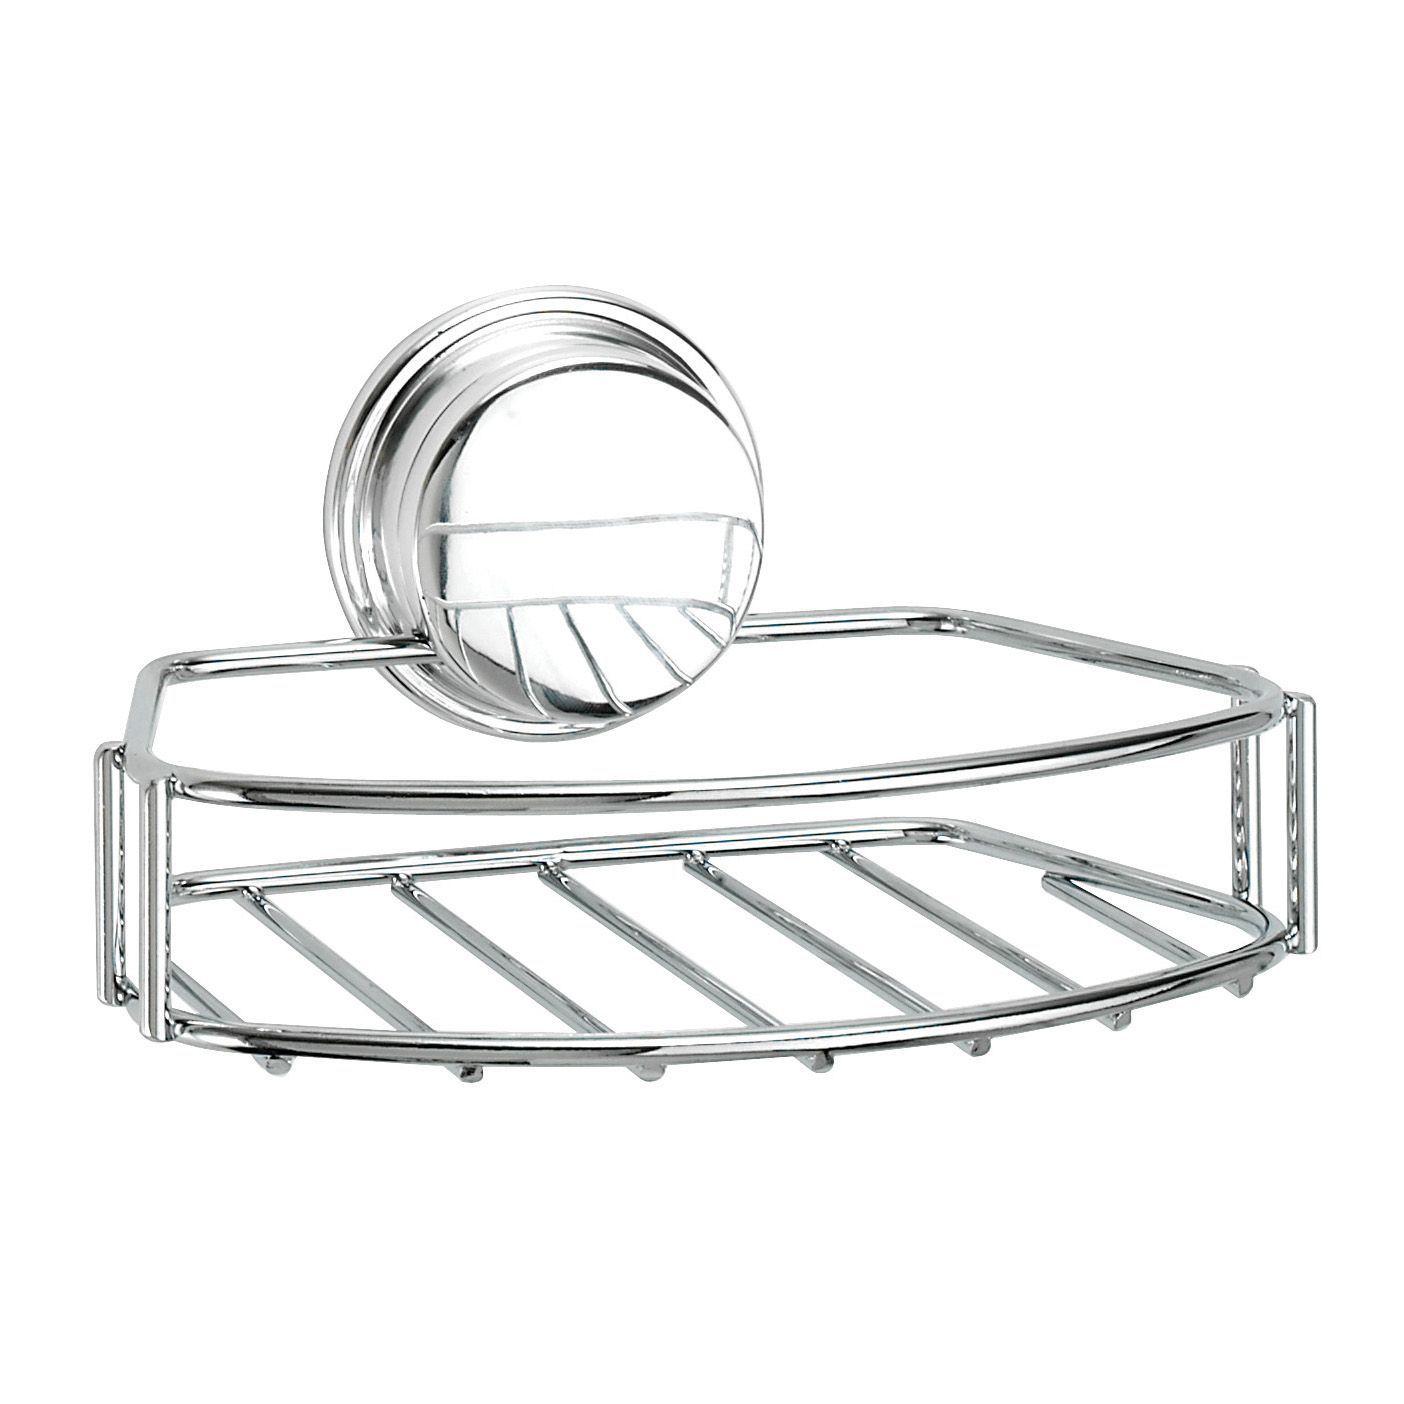 Croydex Stick \'n\' lock Chrome effect Soap basket   Departments   DIY ...